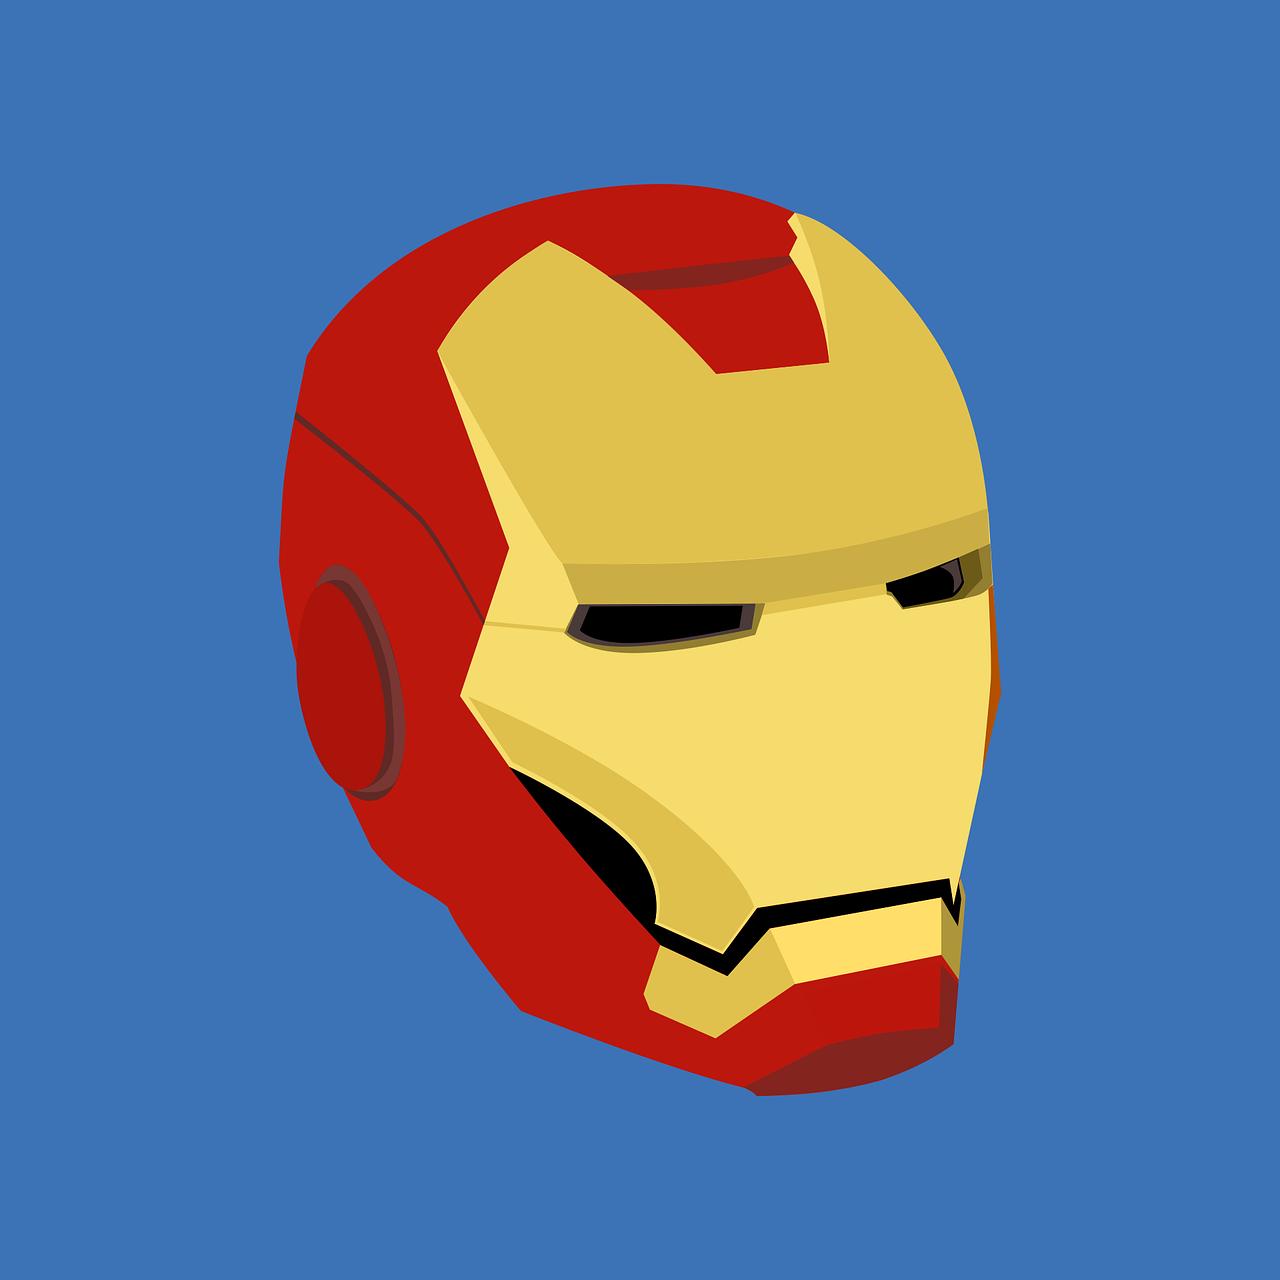 İronman profil resmi